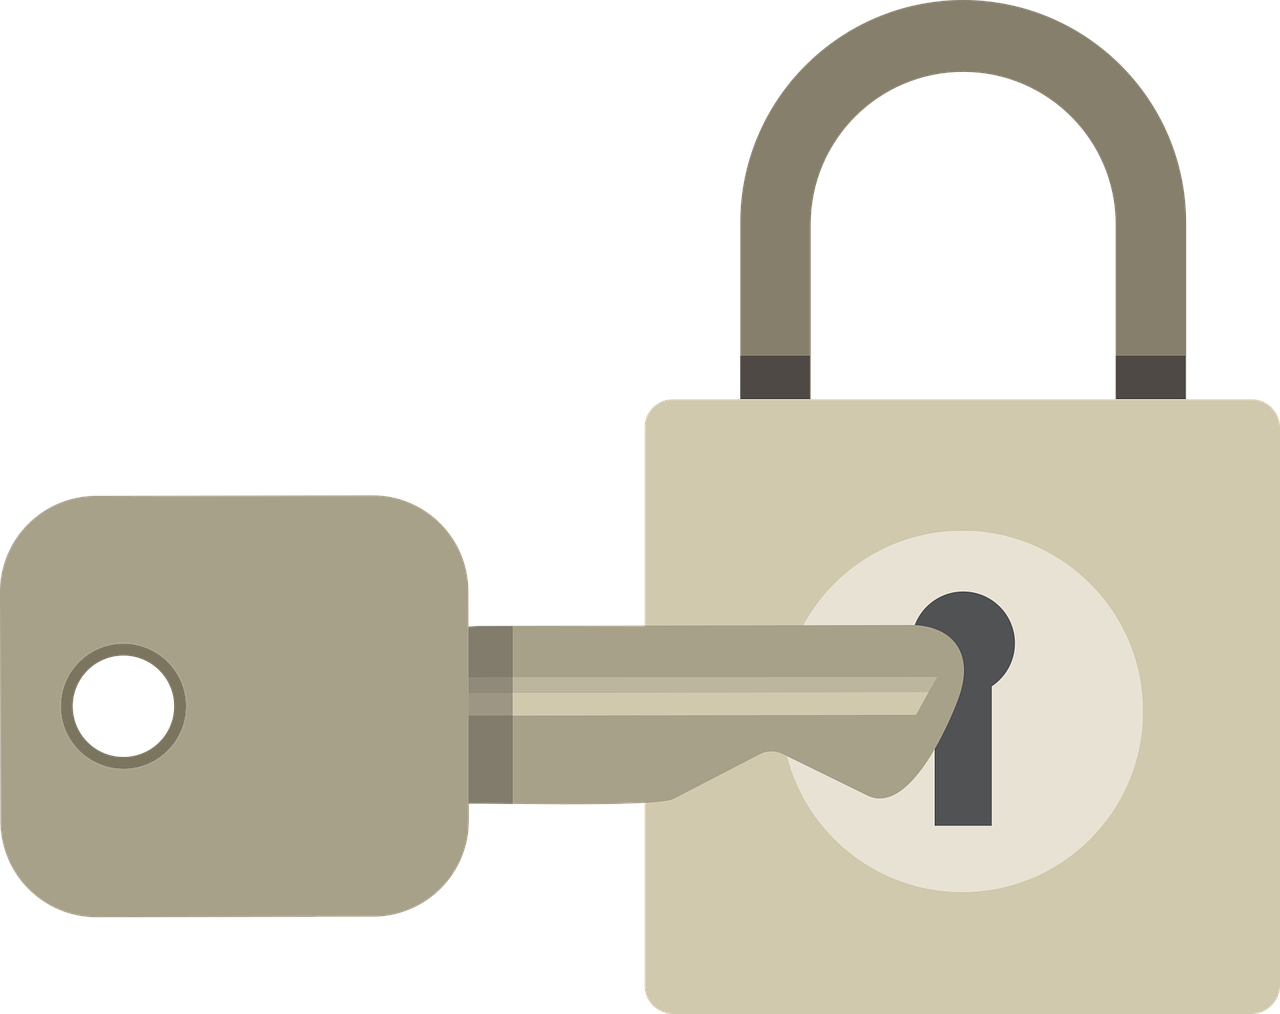 lock, password, key-4441691.jpg